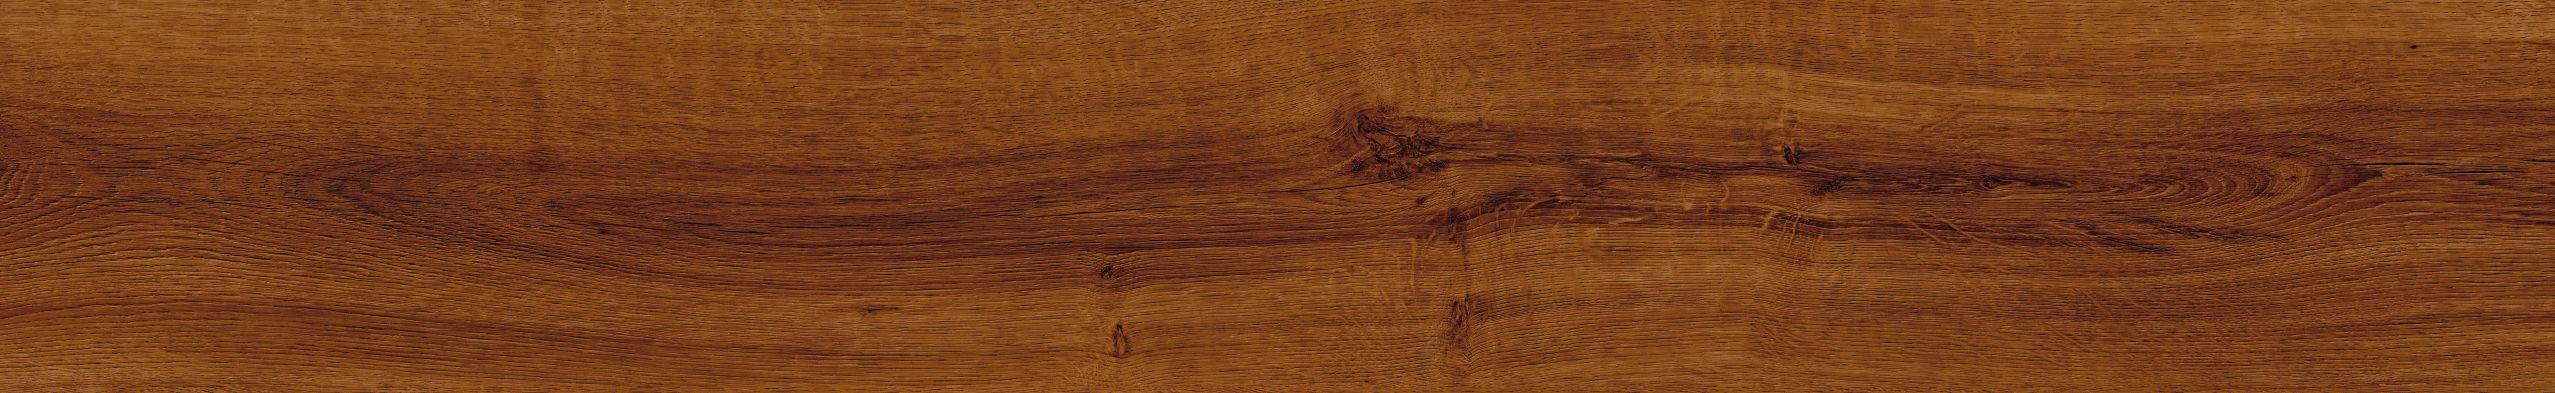 Panele winylowe LVT modulari ® WOOD DRYBACK 19,6 x 132 cm 24572